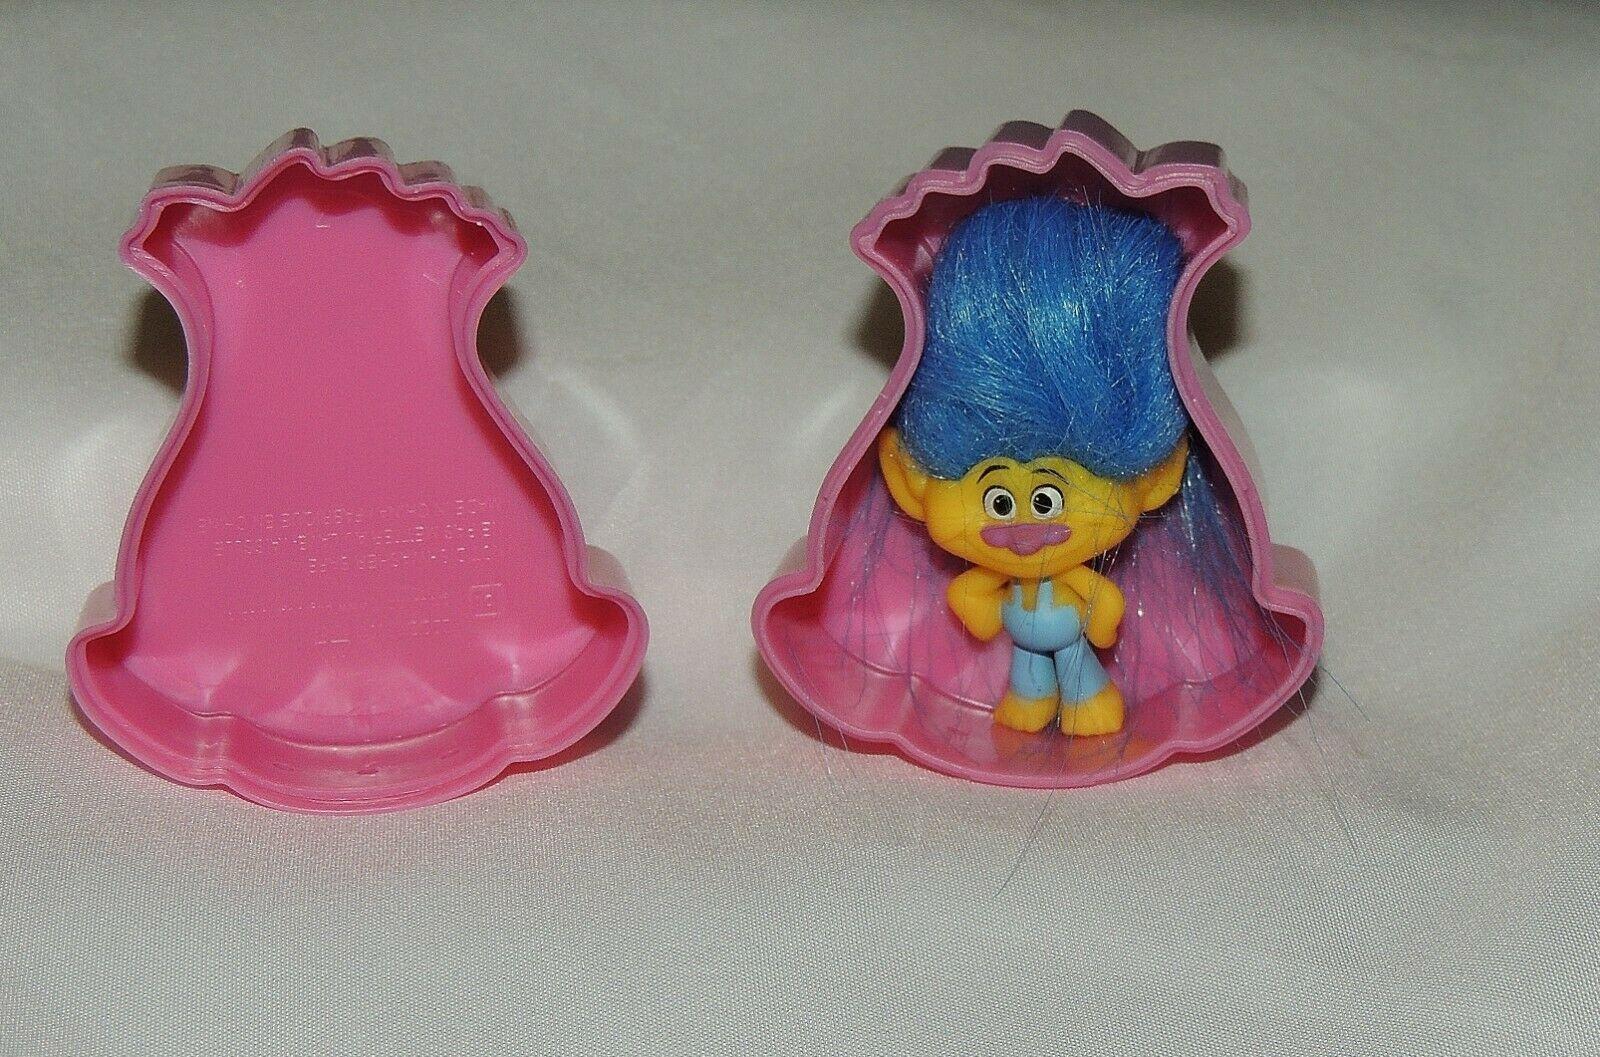 Neuf Trolls Pochette Surprise Figurines You Pick W/Containers Oeuf de Pâques